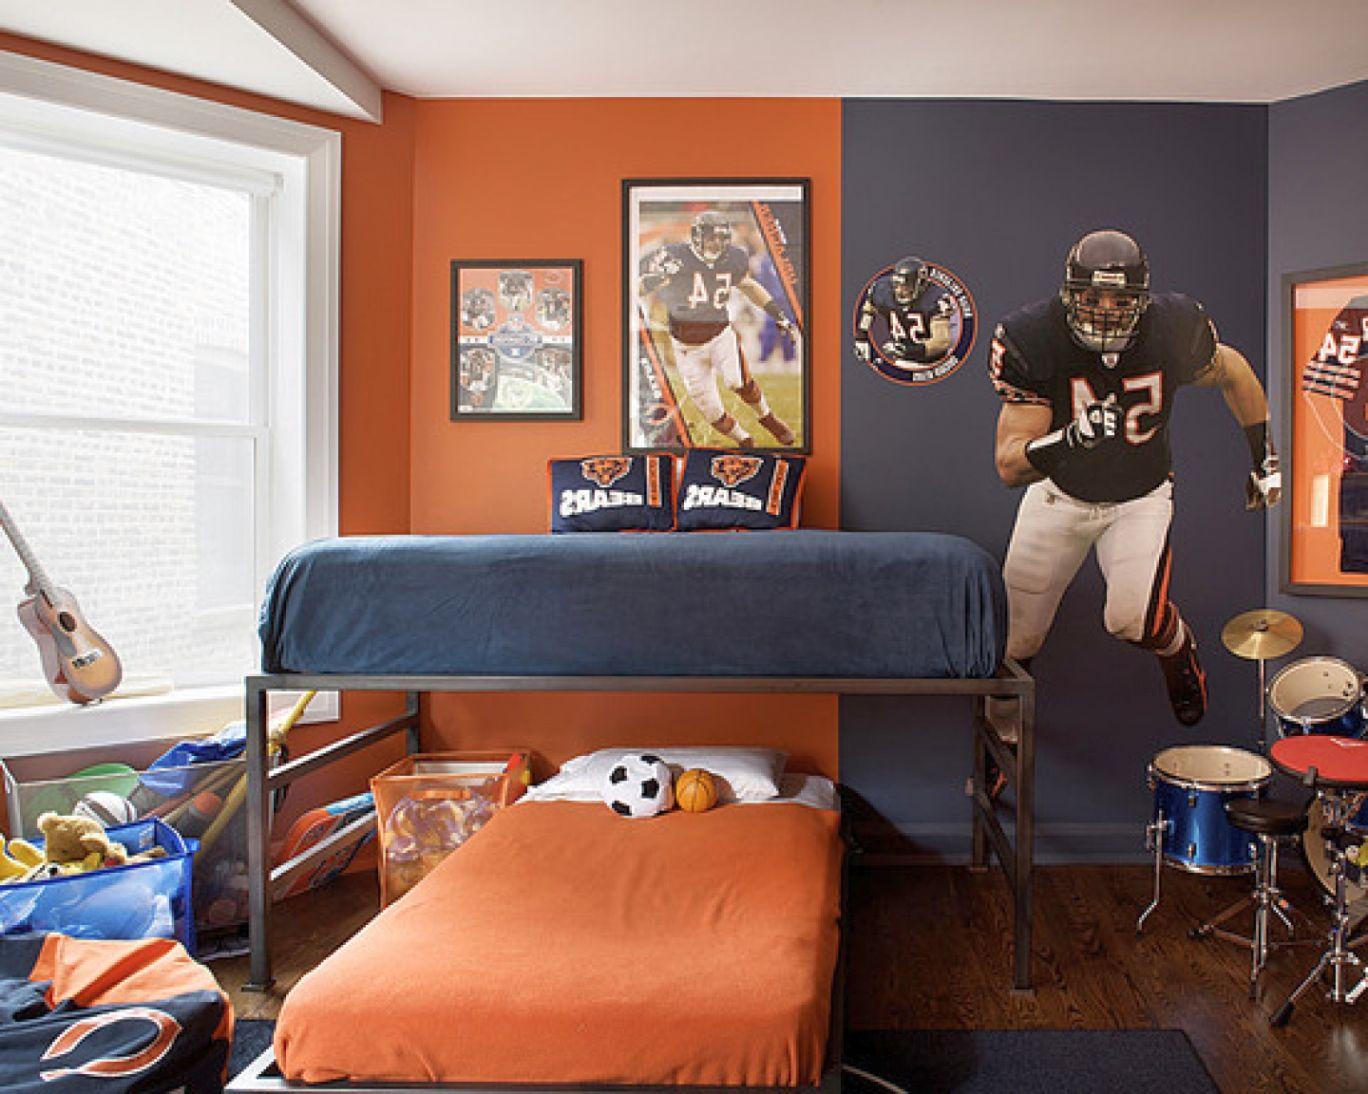 12 Superb Room Decor Ideas for Teenage Boys on Rooms For Teenage Guys  id=34763